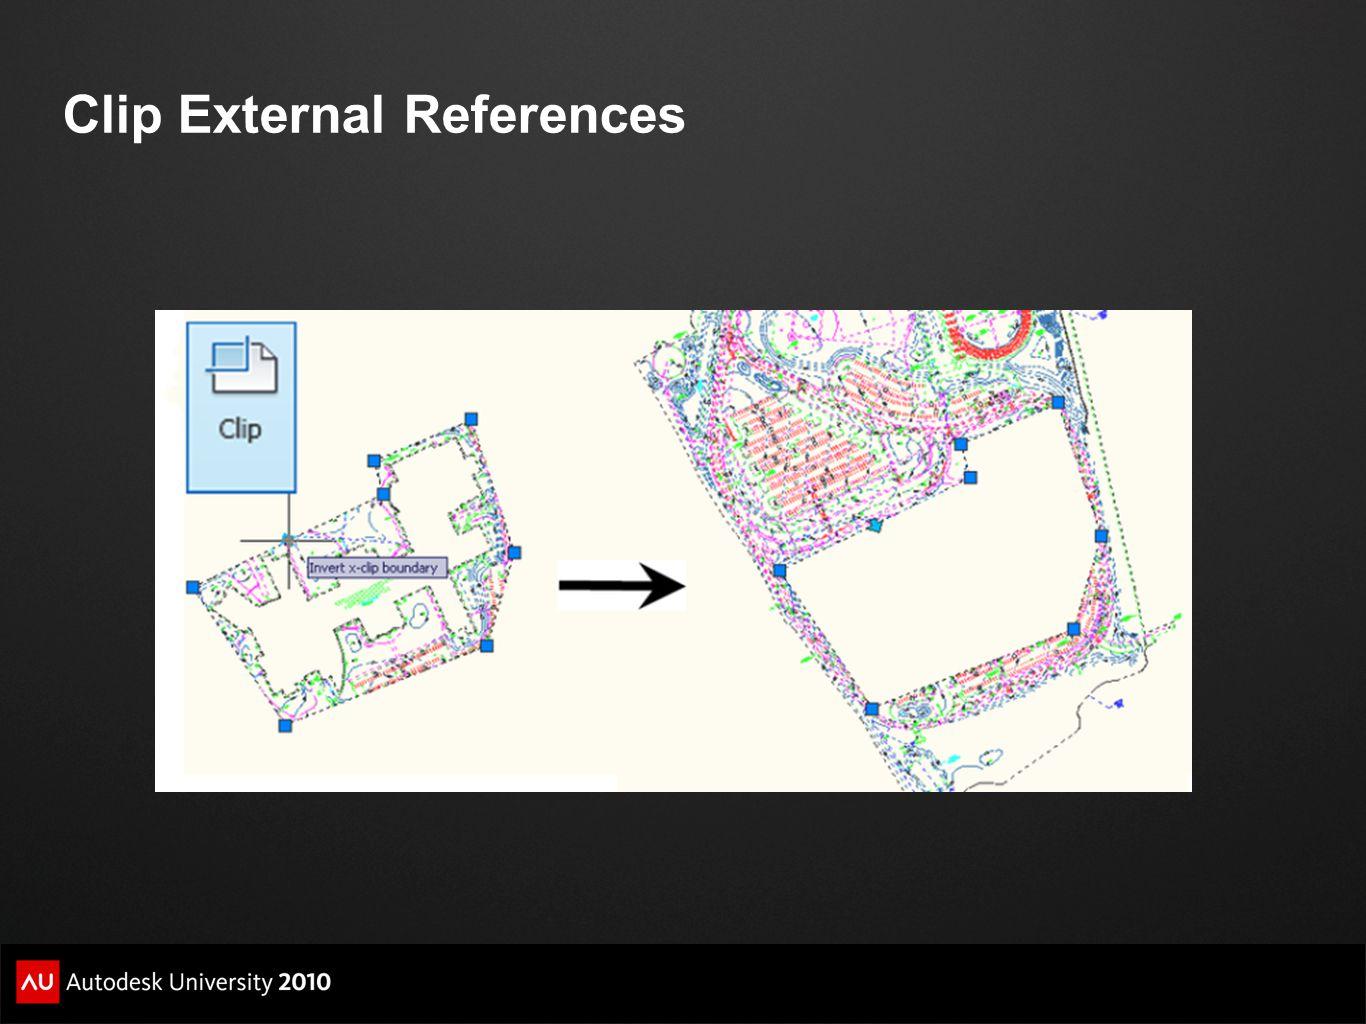 Clip External References